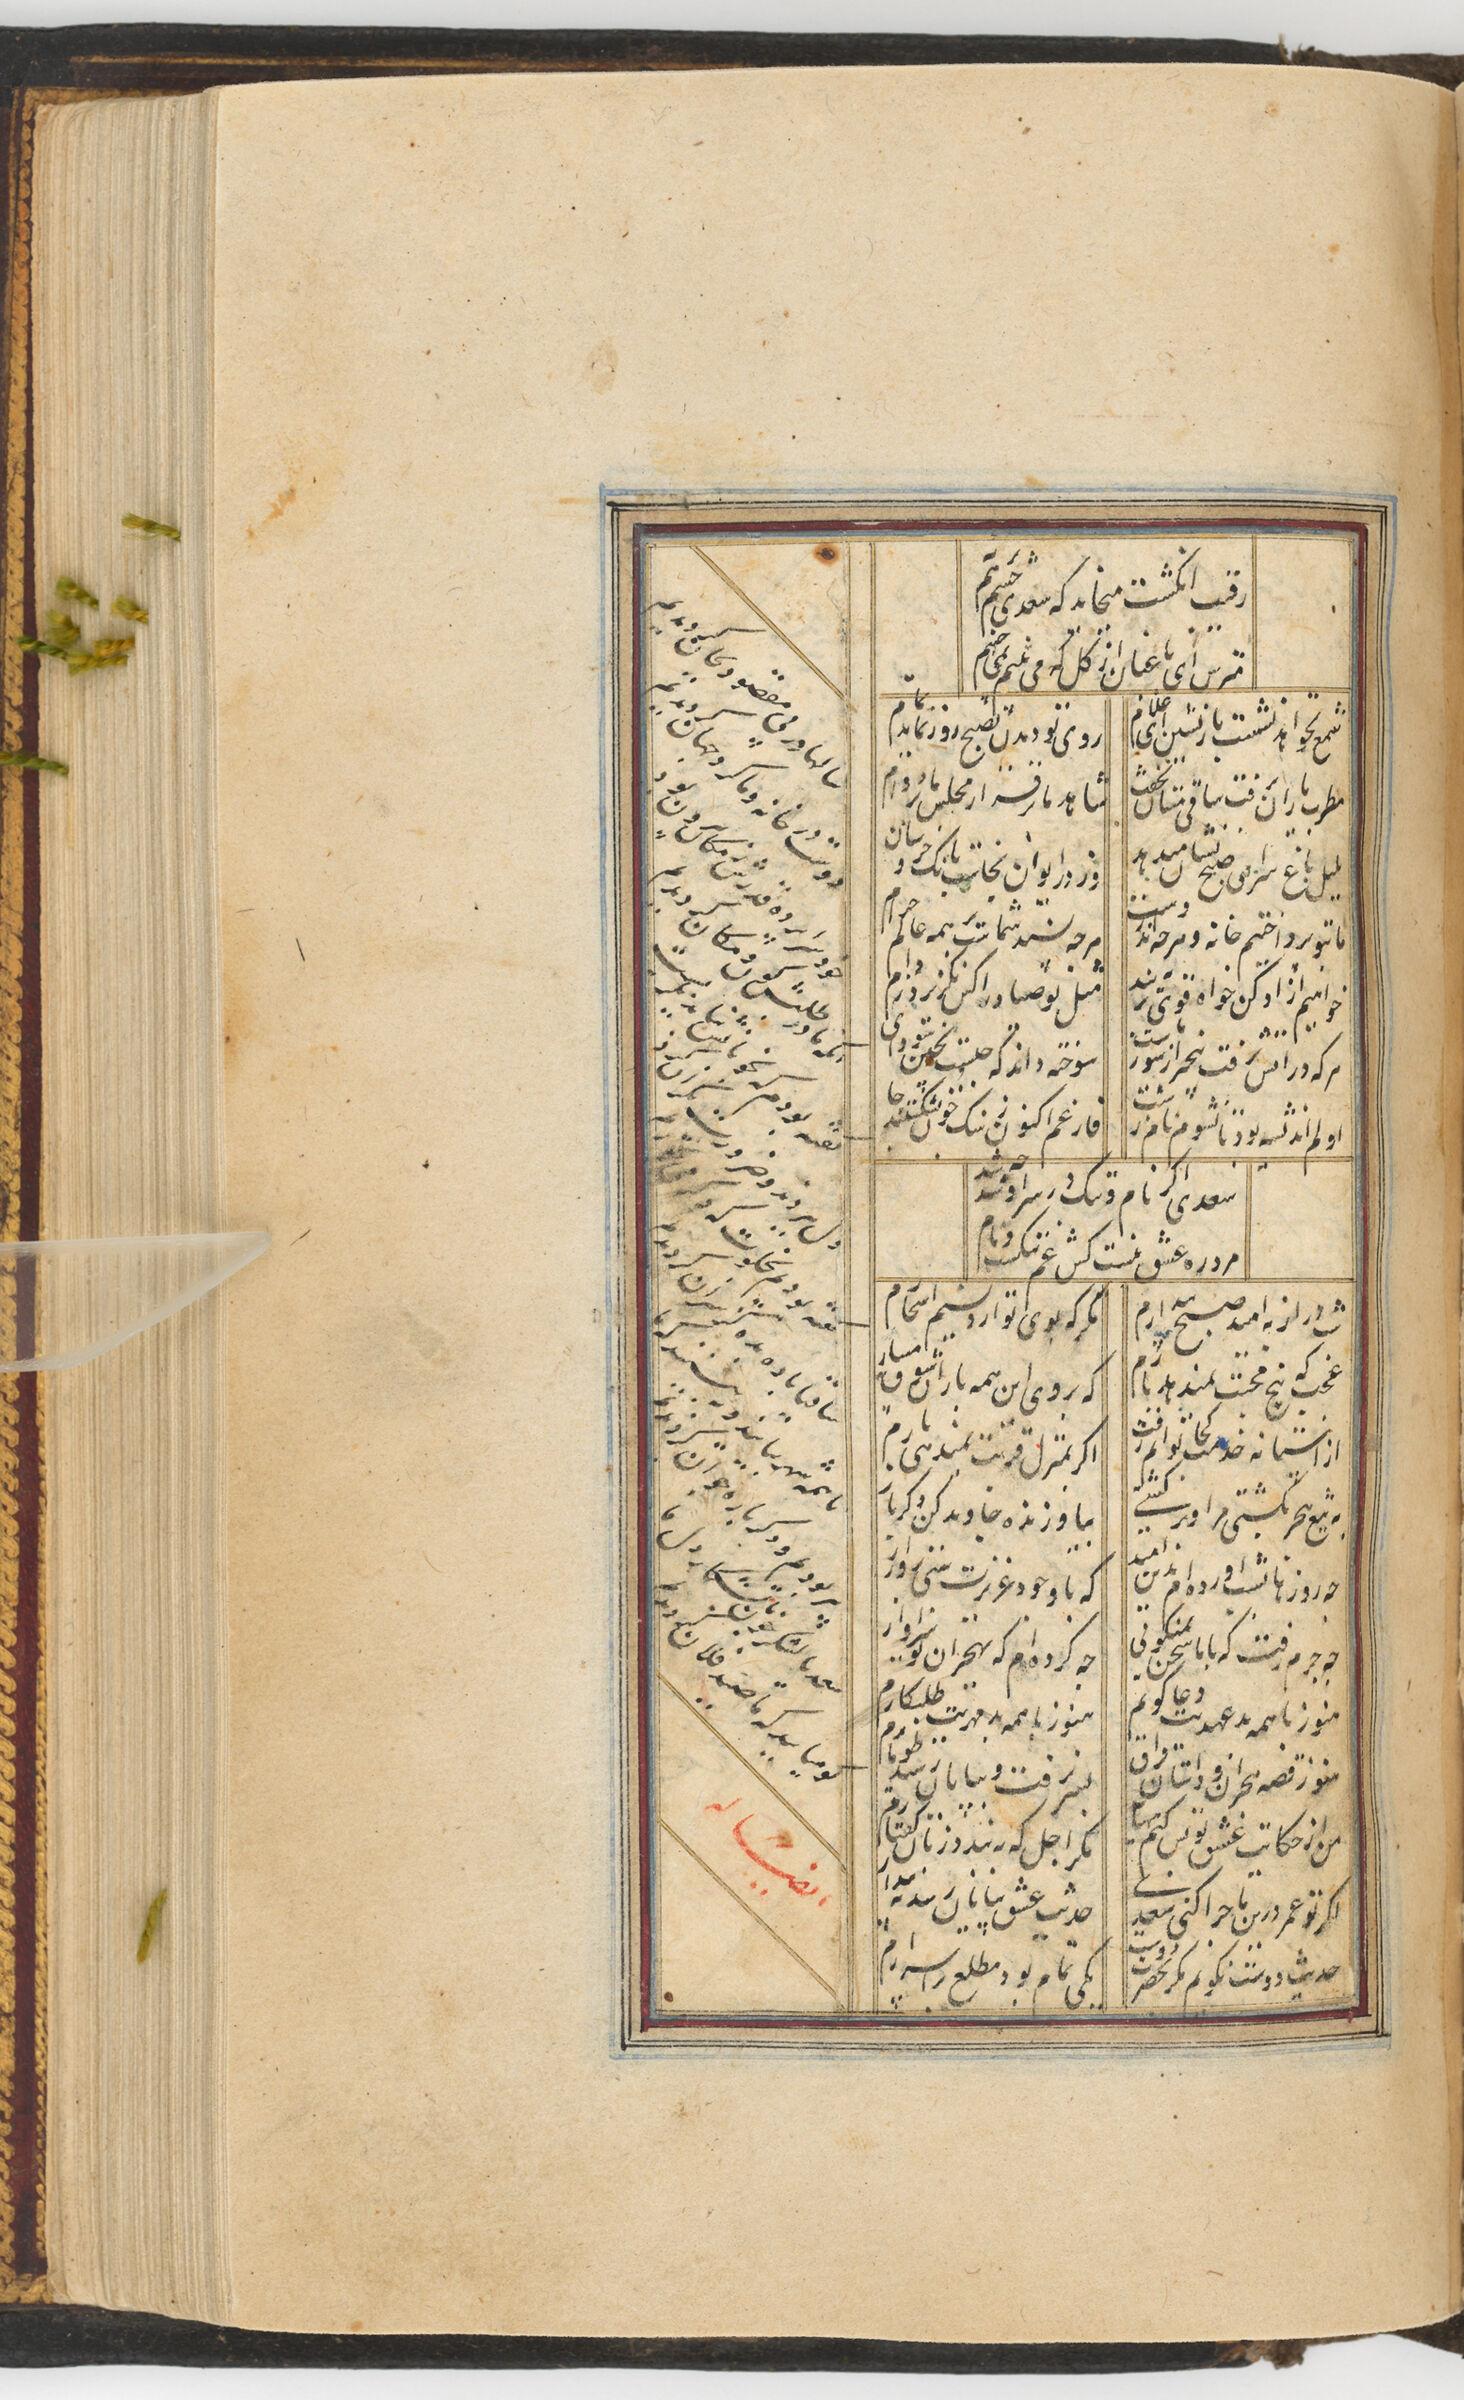 Text Folio (Text Recto; Text Verso Of Folio 239), From A Manuscript Of The Kulliyat Of Sa'di